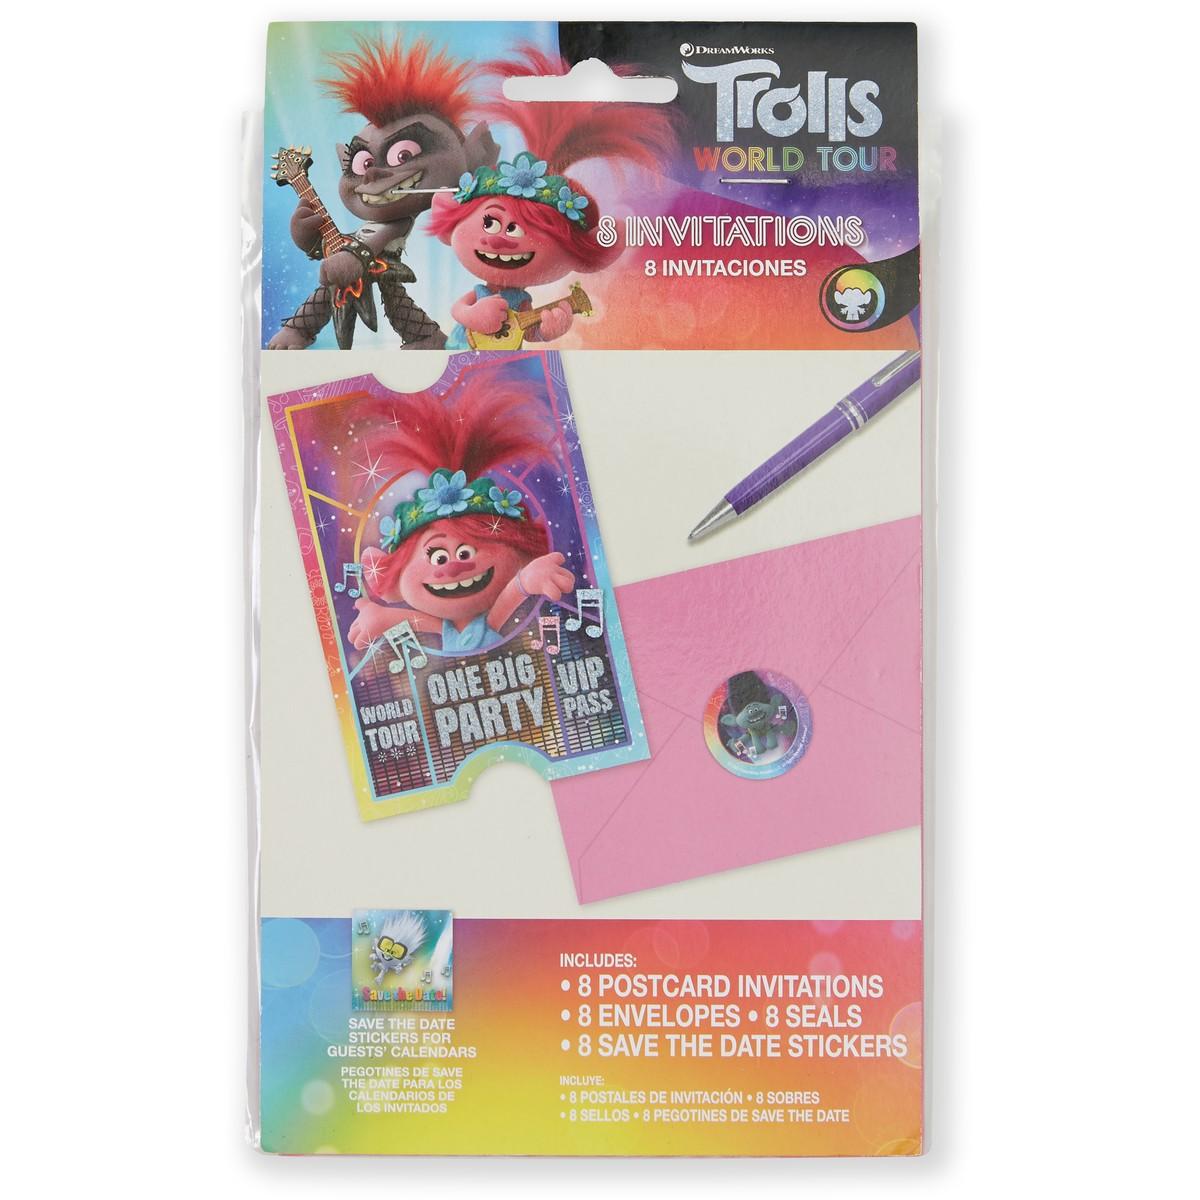 trolls world tour postcard invitations 8 pack